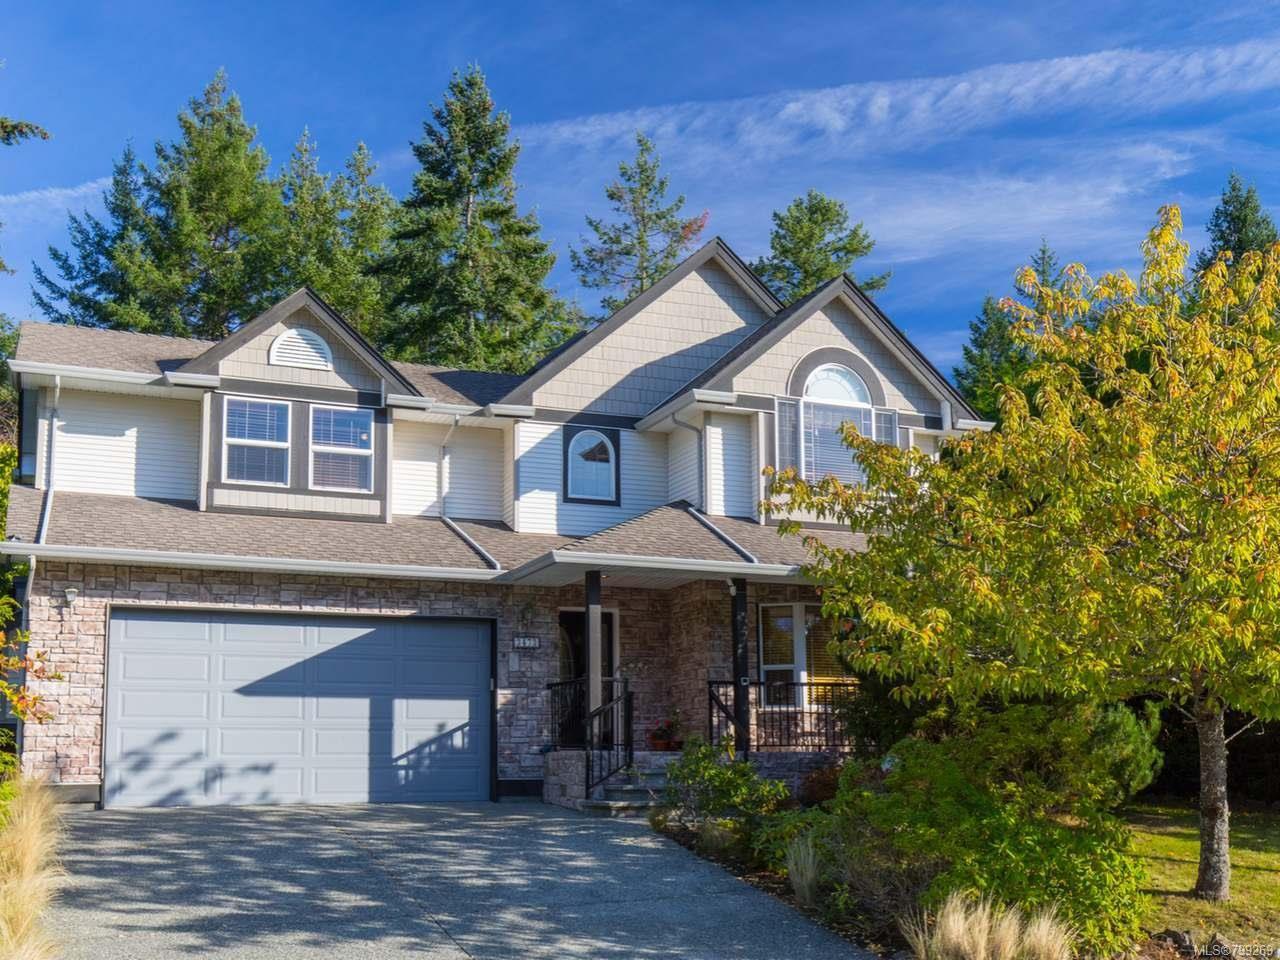 Main Photo: 3473 Budehaven Dr in NANAIMO: Na Hammond Bay House for sale (Nanaimo)  : MLS®# 799269